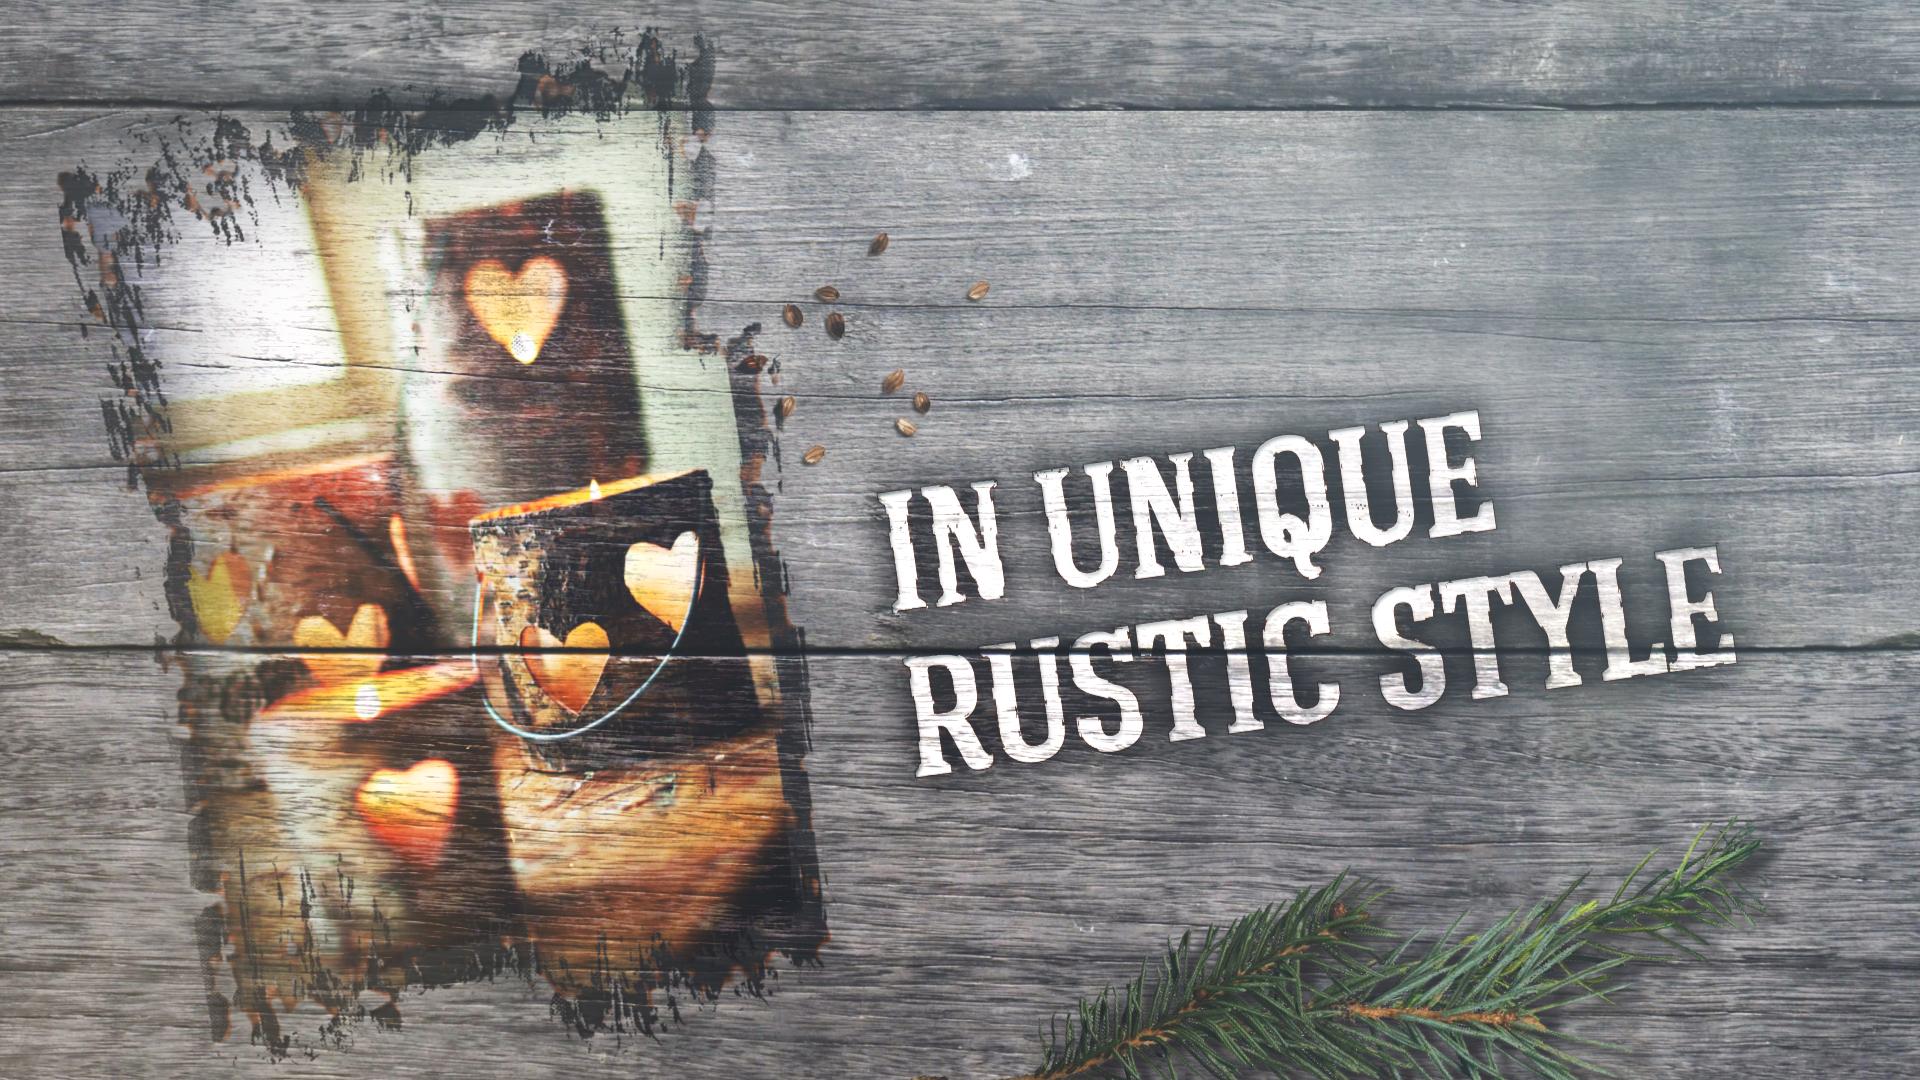 Woodcut_Rustic_Slideshow_1080p_00624